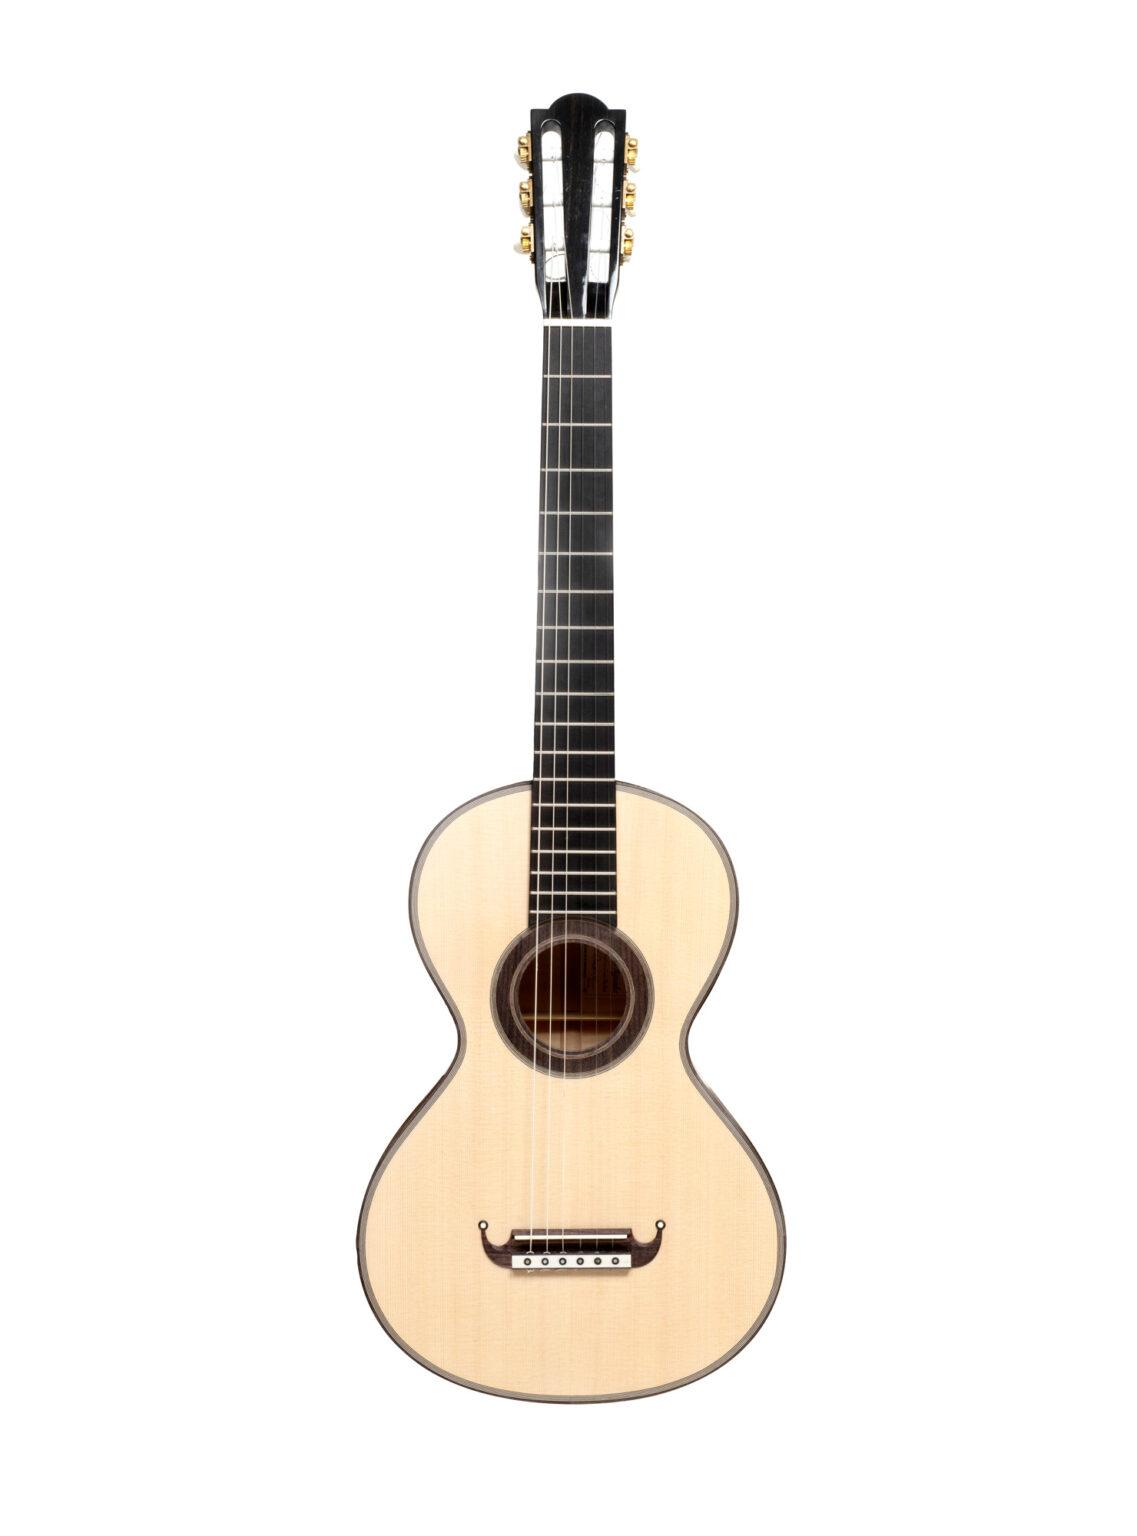 Guitarras de Angel Benito Aguado - Reproducciones de guitarras históricas - Coffe-Goguette